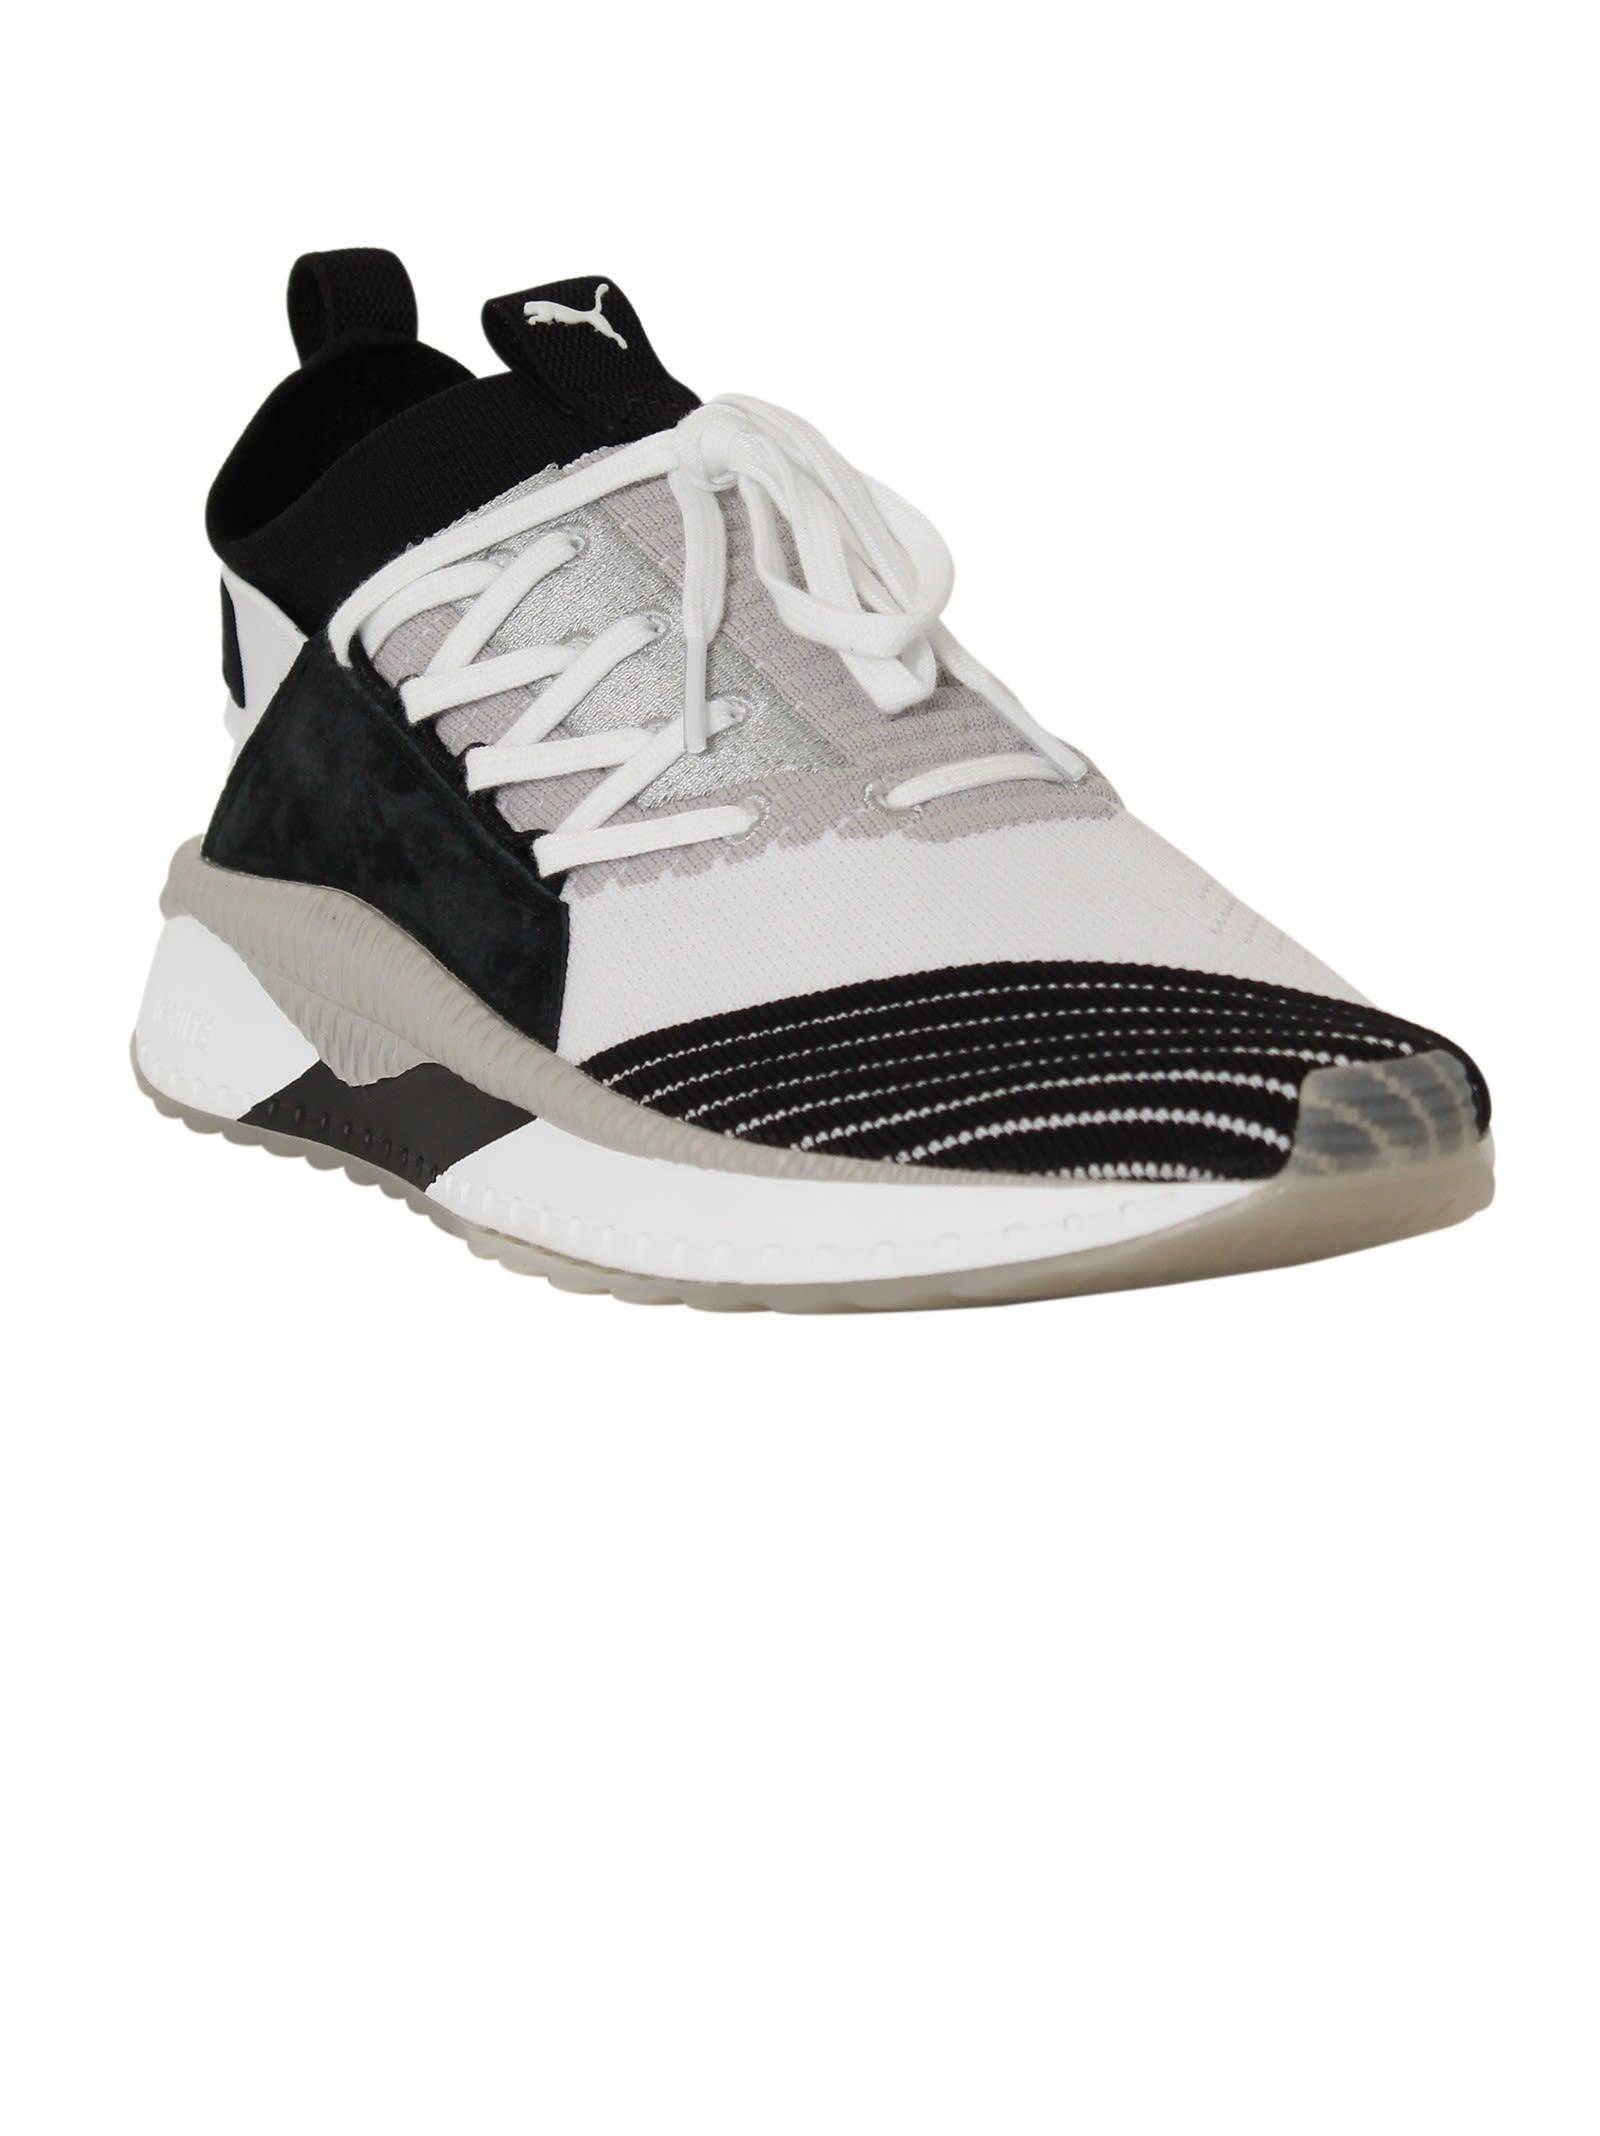 Puma White Black Tsugi Jun Sneakers